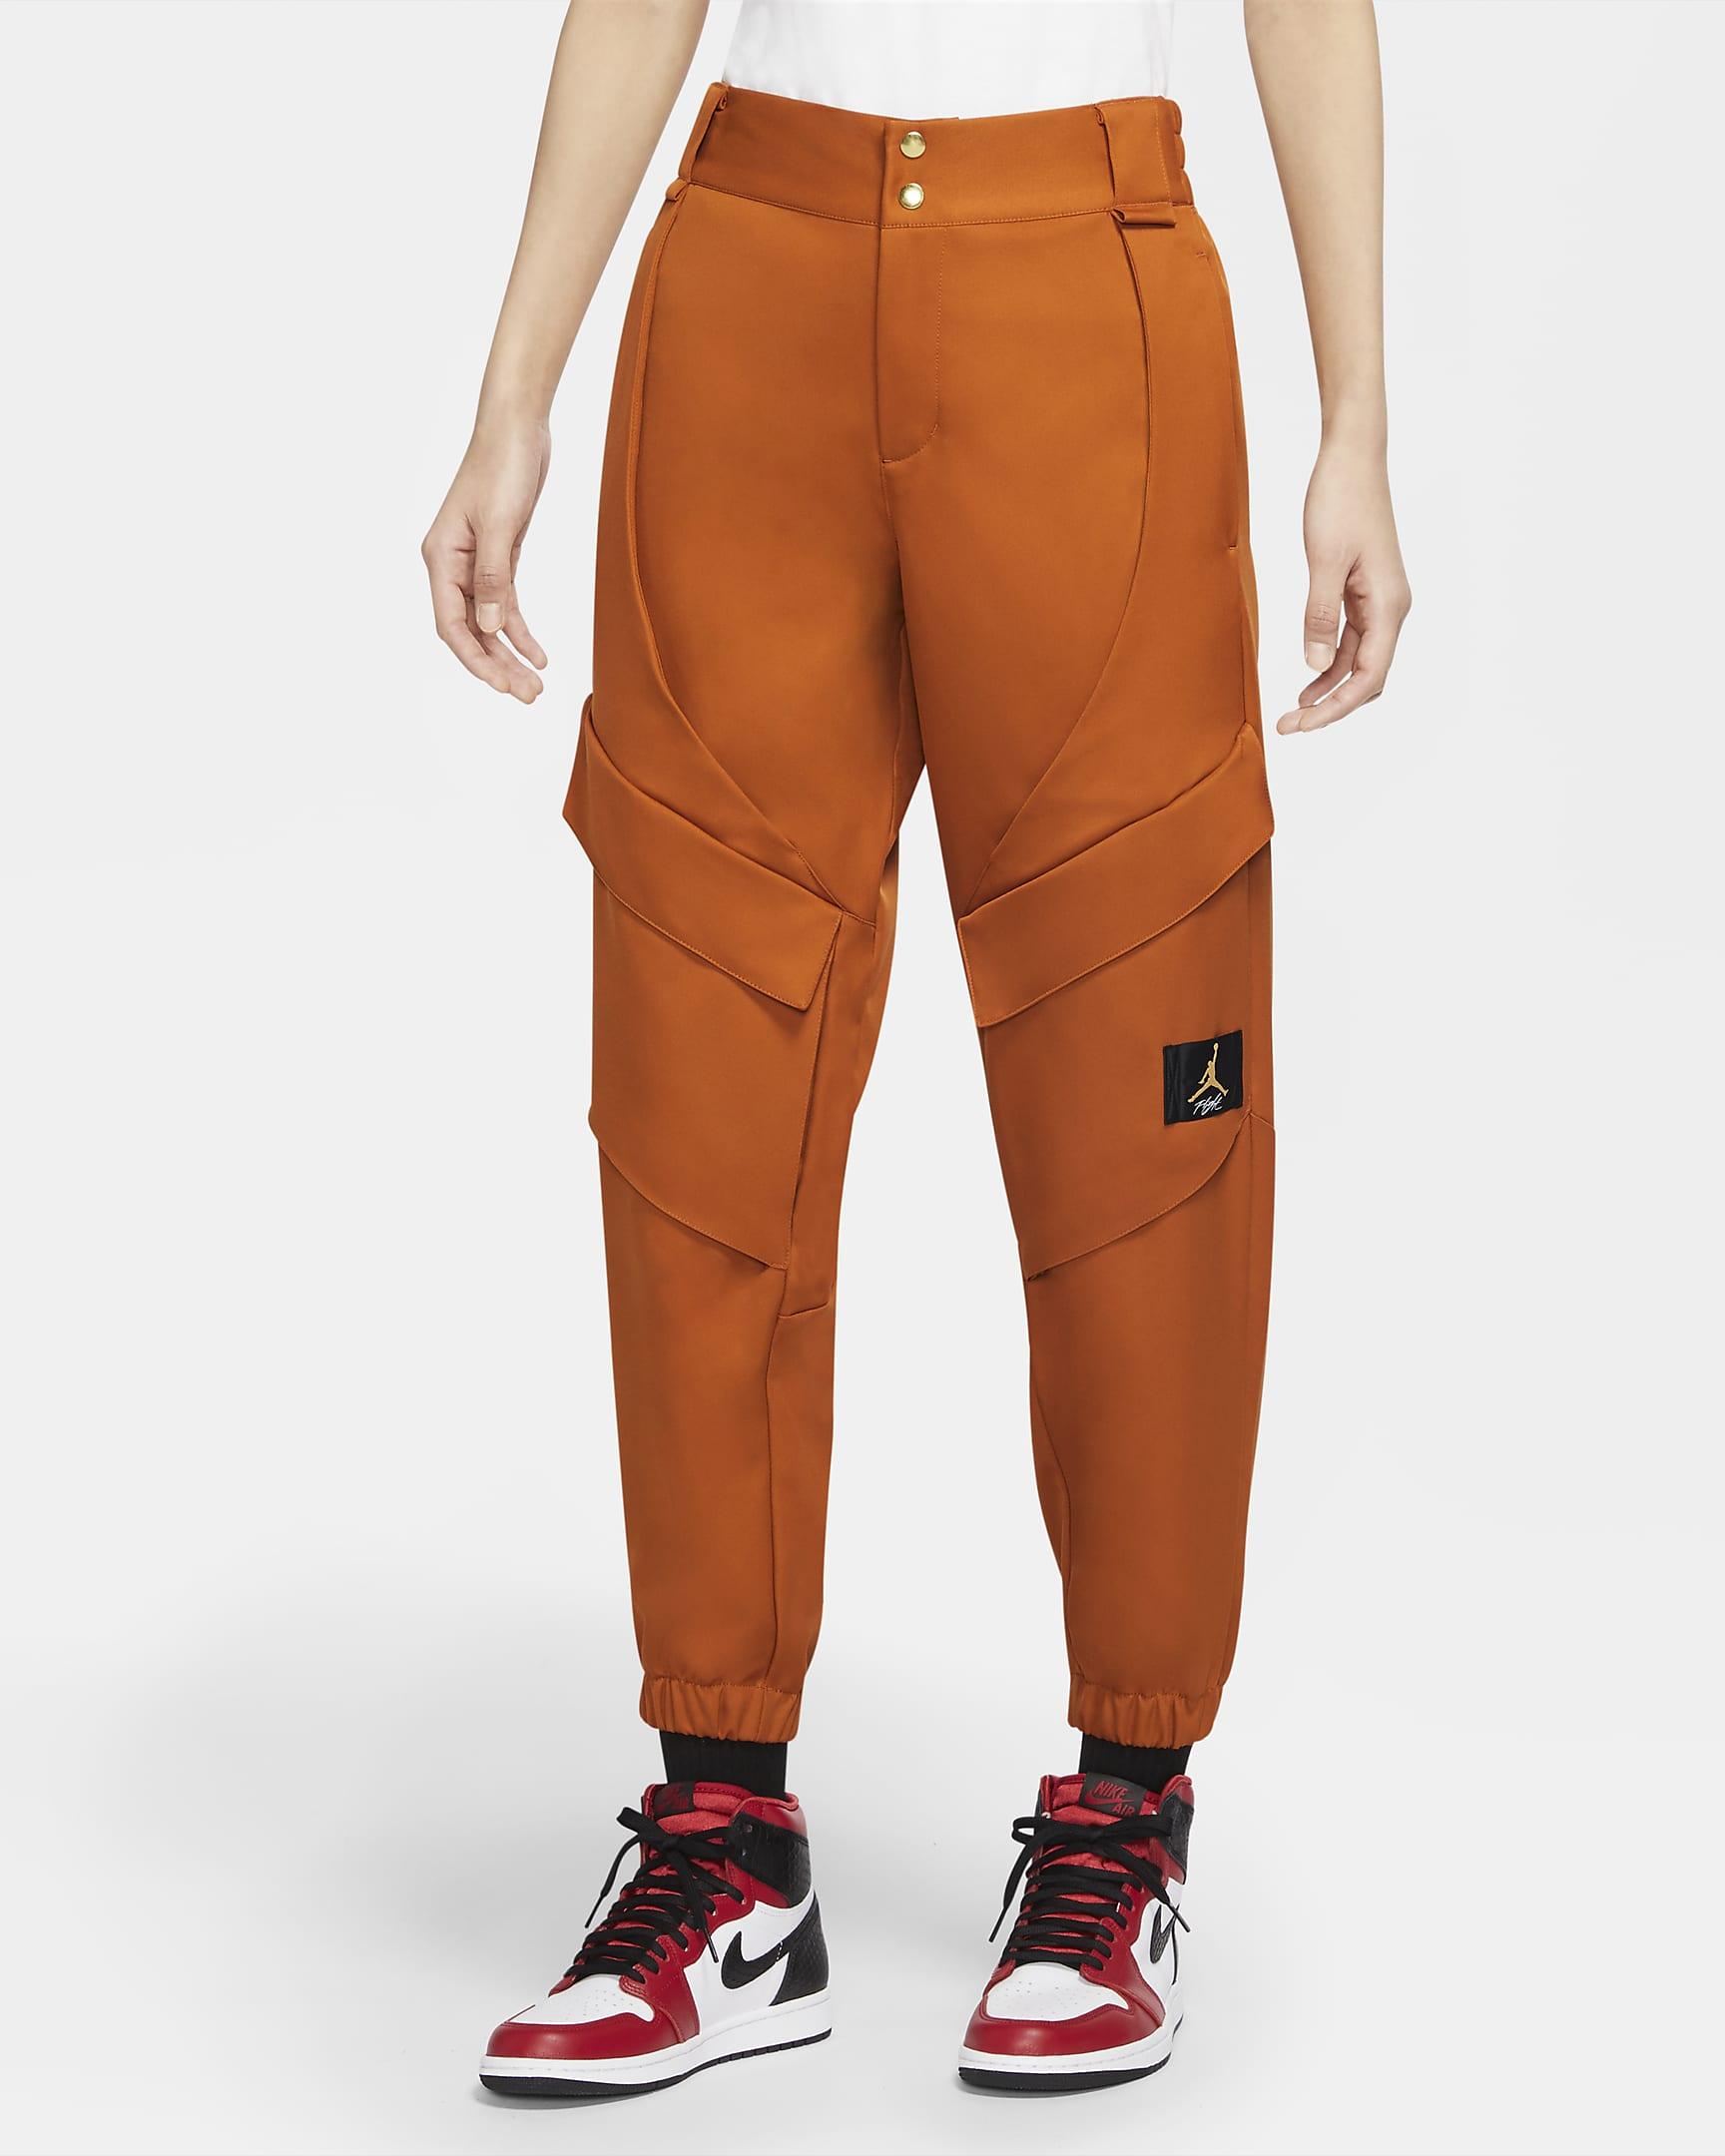 jordan-essential-womens-utility-pants-nRqDZ8.png